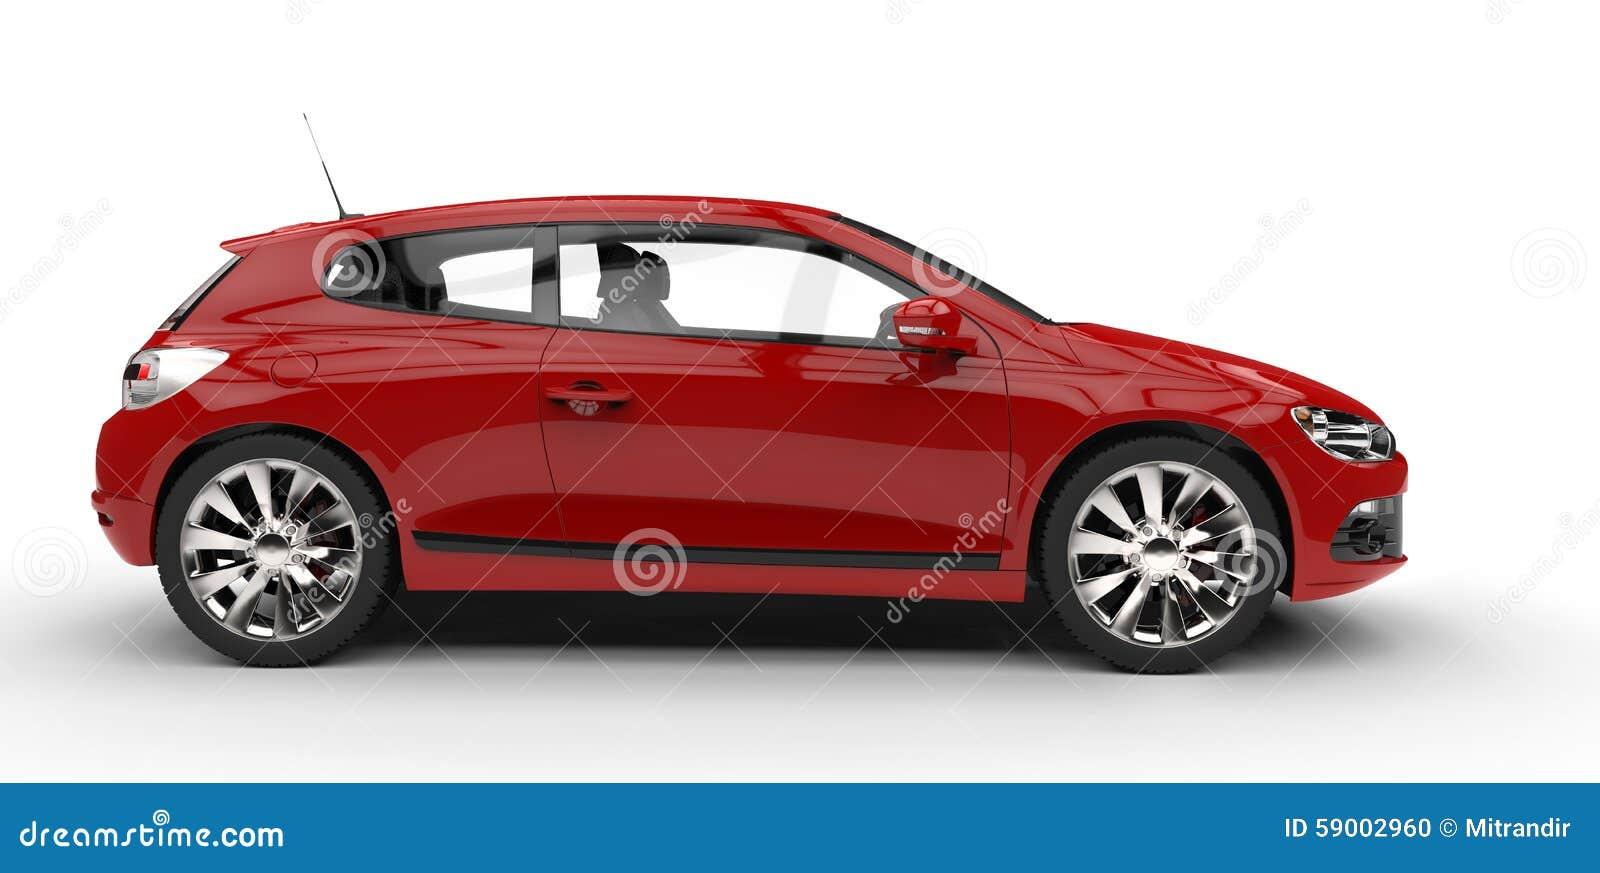 voiture familiale rouge vue de c t illustration stock illustration du brillant luxe 59002960. Black Bedroom Furniture Sets. Home Design Ideas